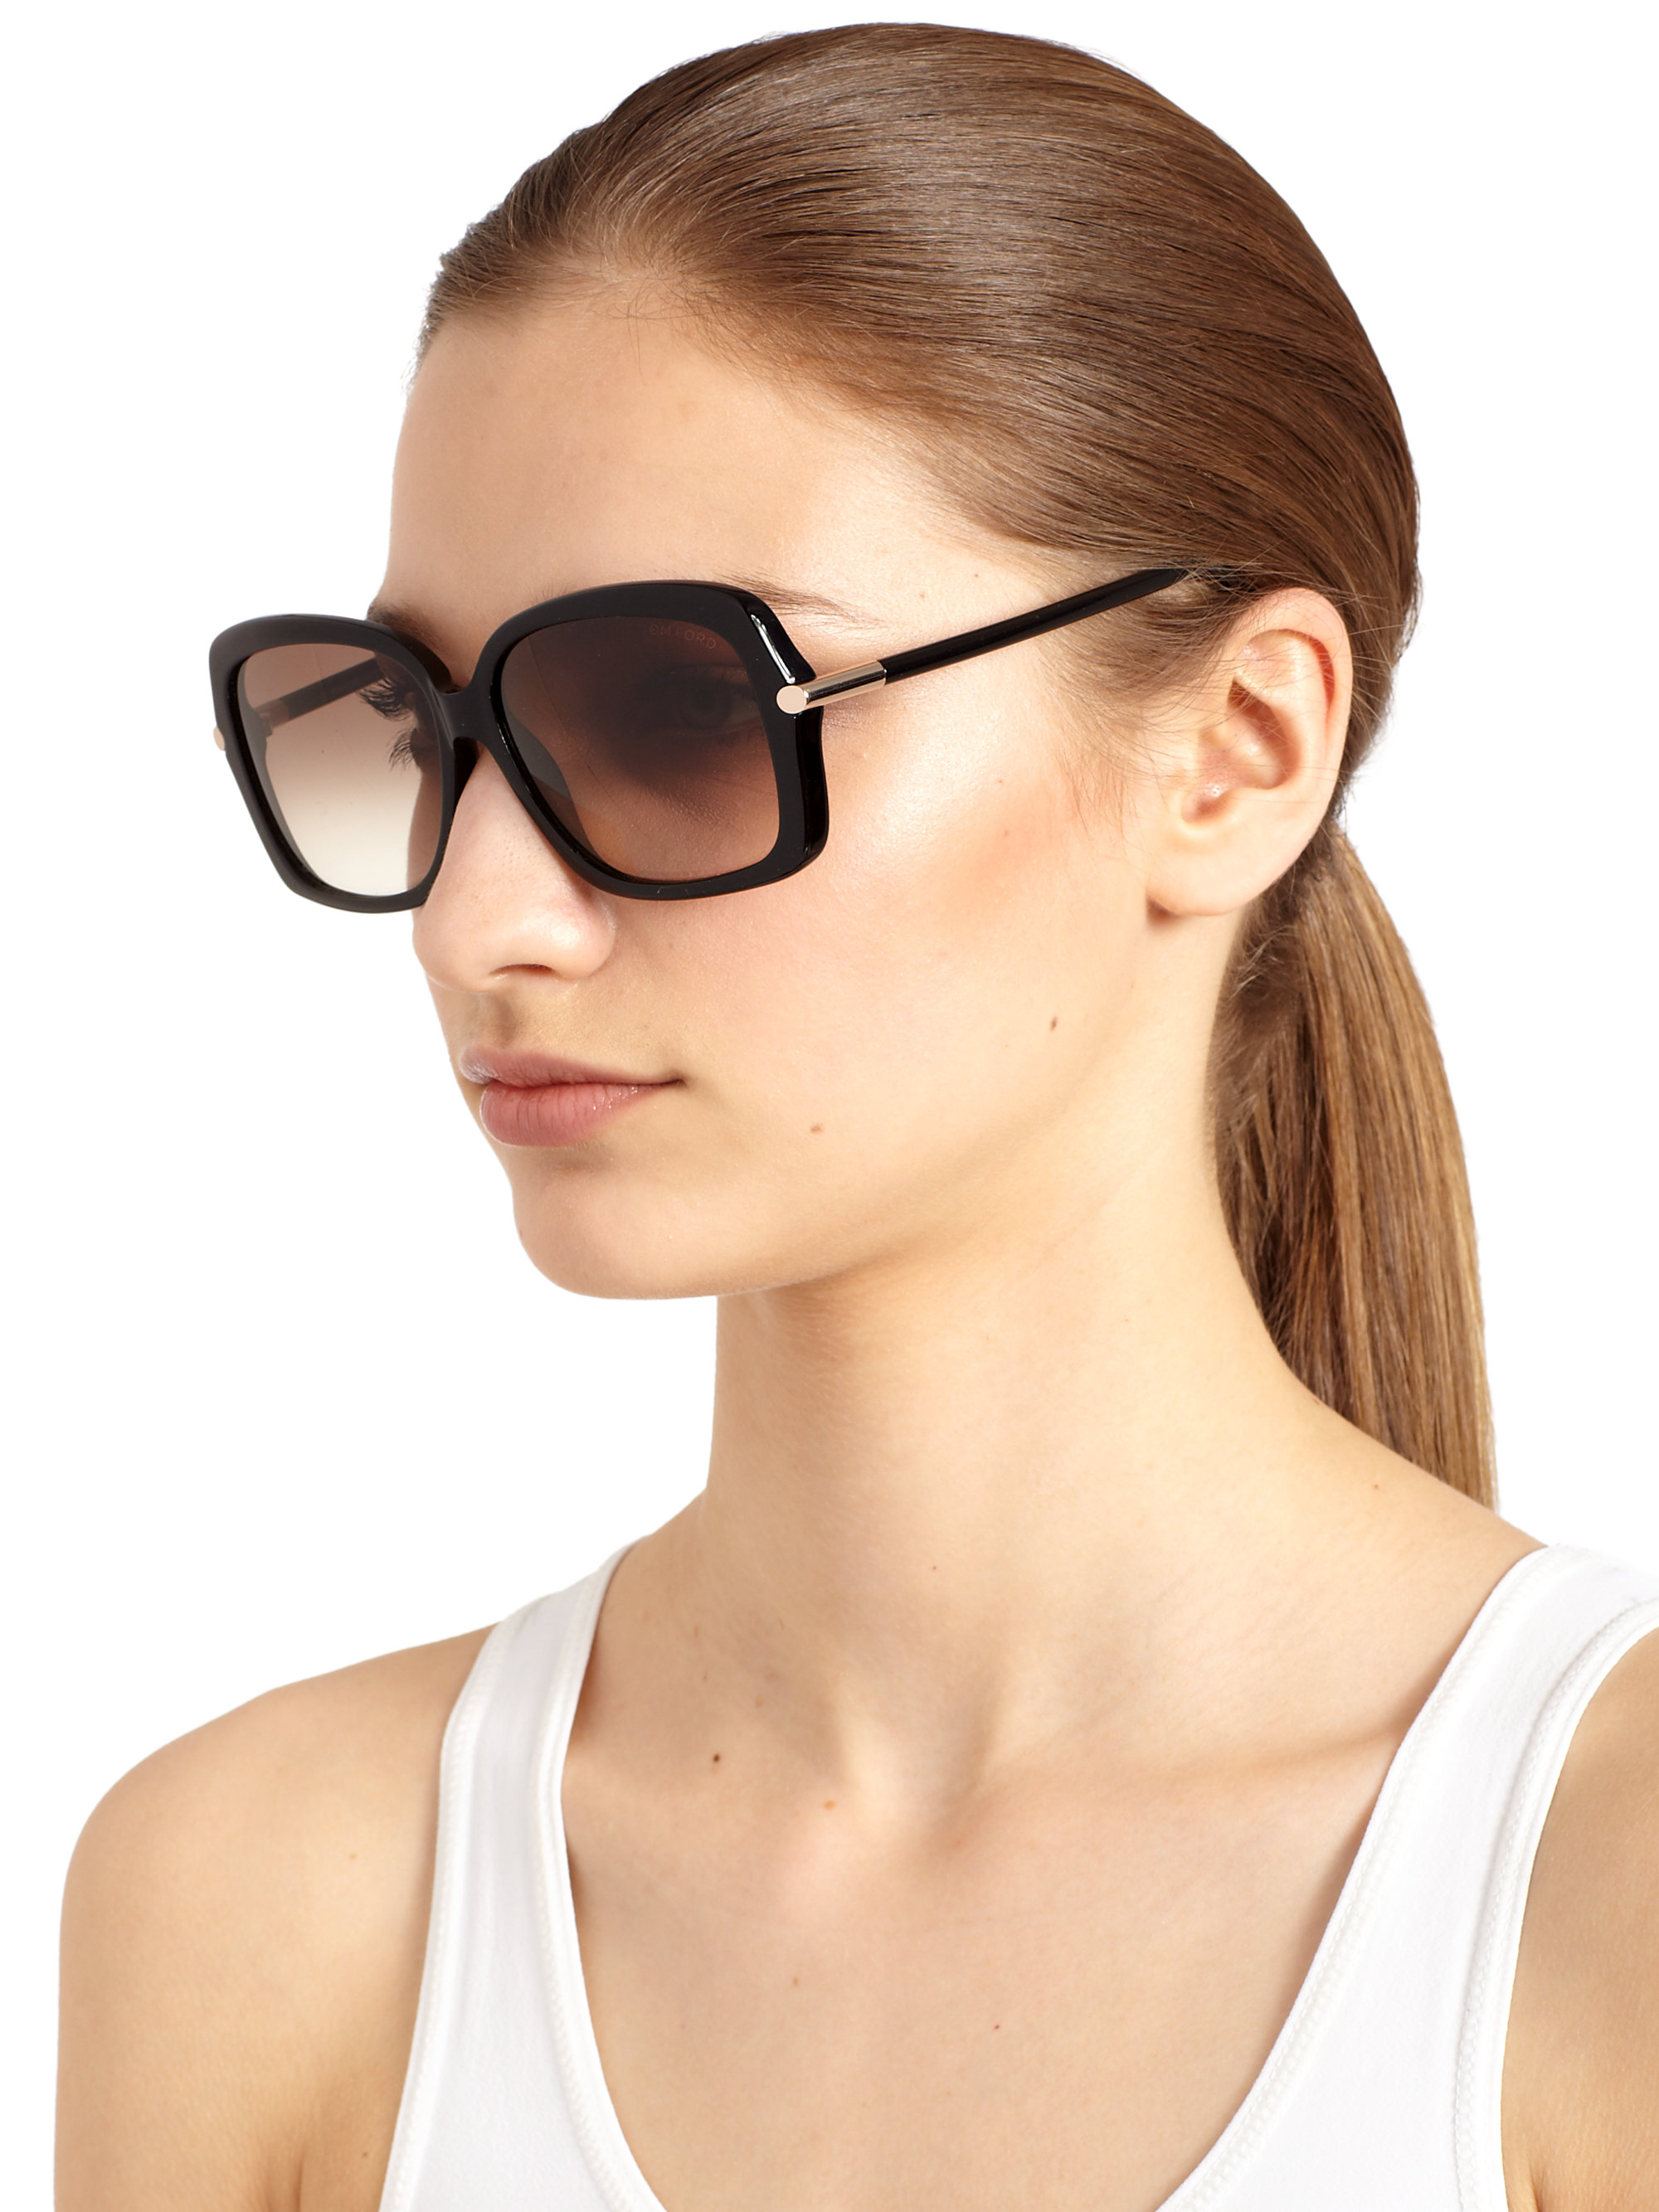 08eff9e2d1c2e Tom Ford Paloma Oversized Square Sunglasses in Black - Lyst